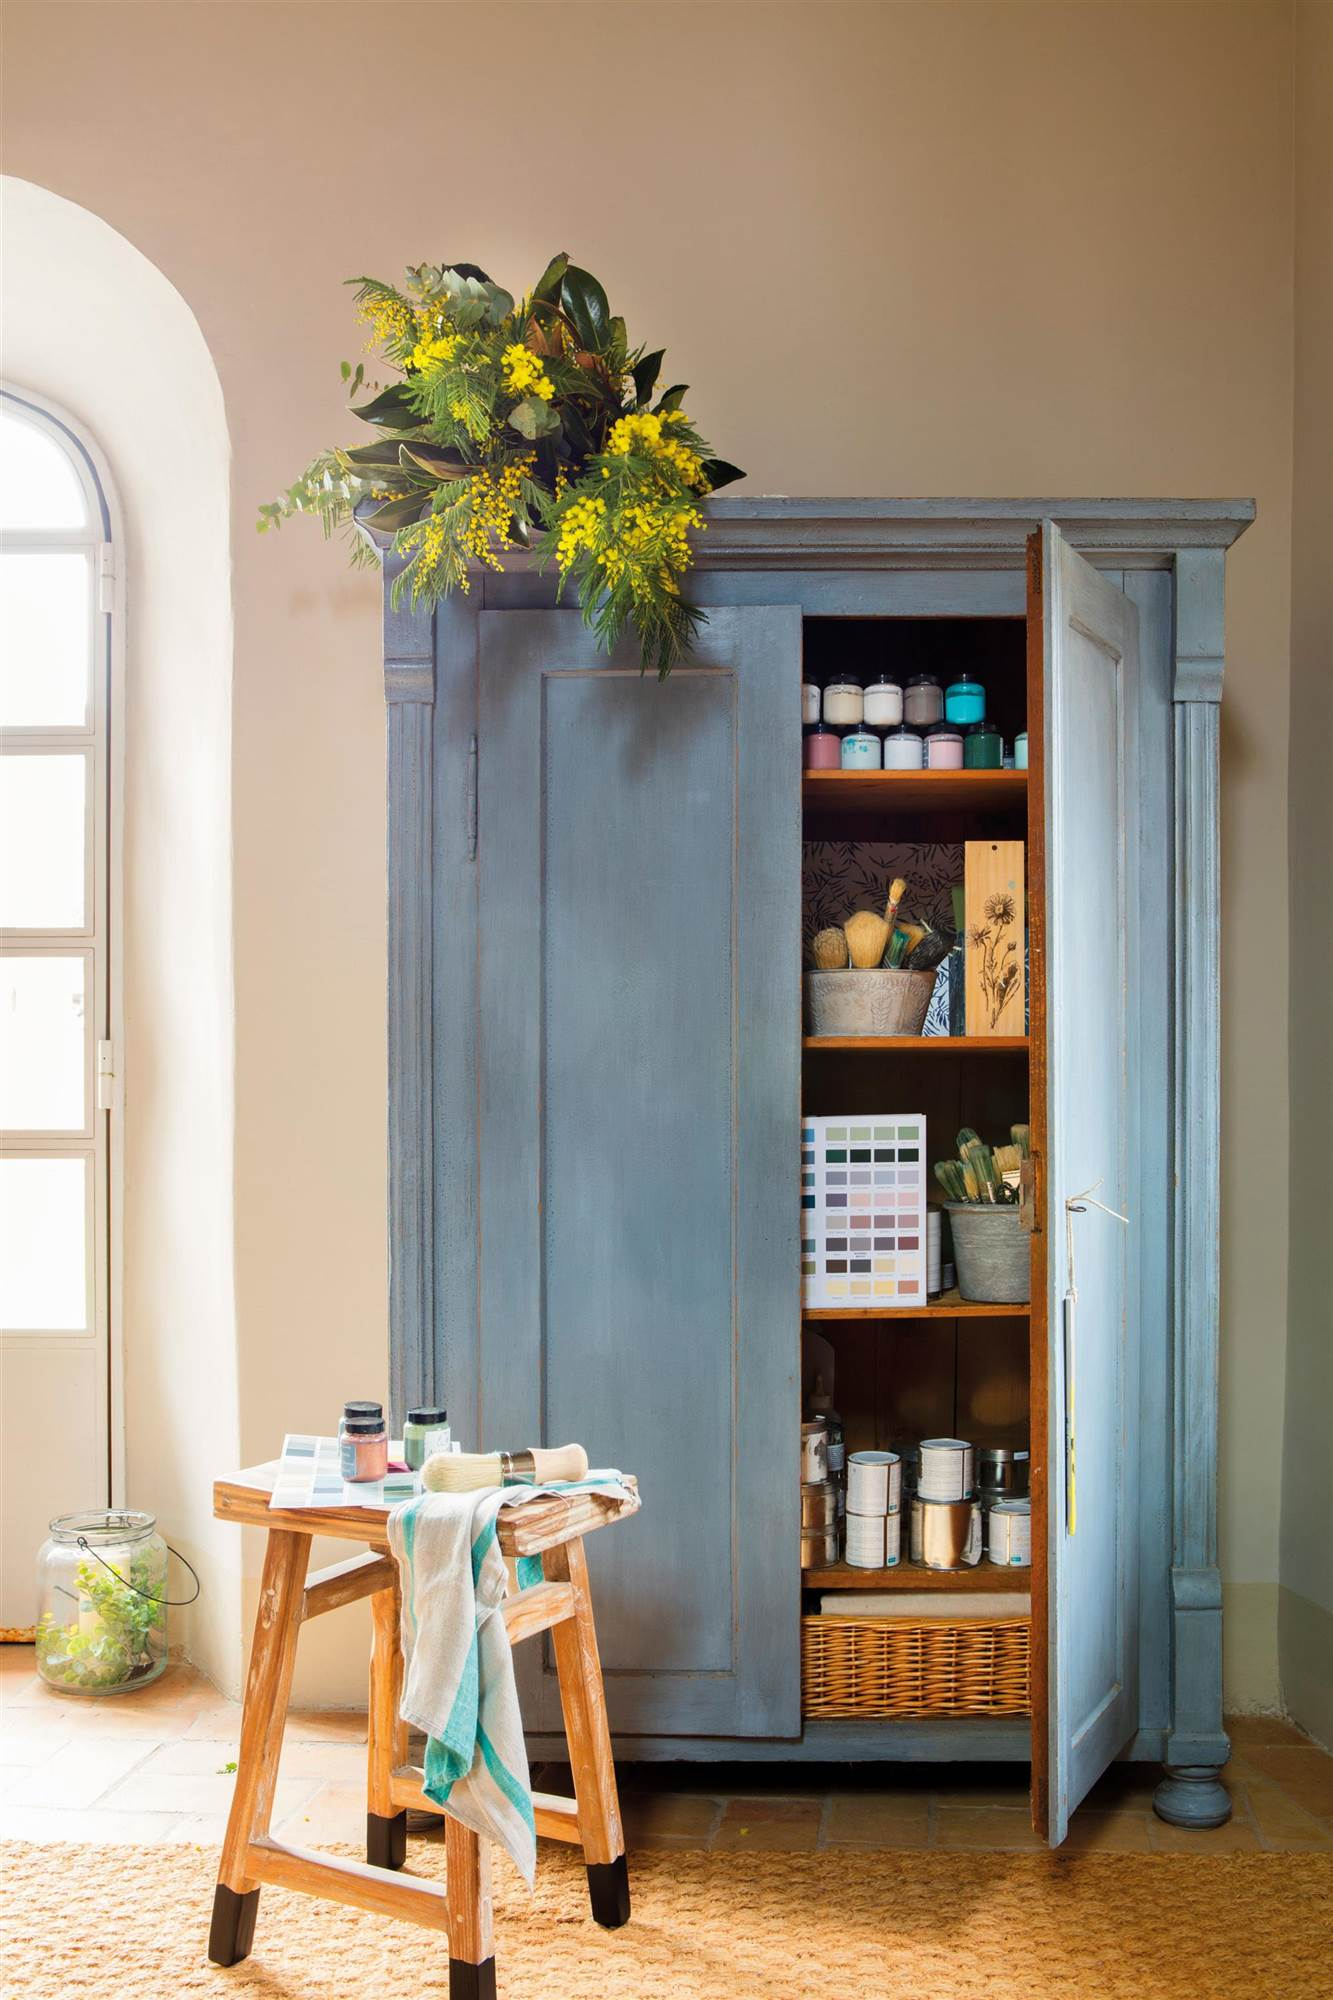 Cmo pintar muebles antiguos modernos de madera